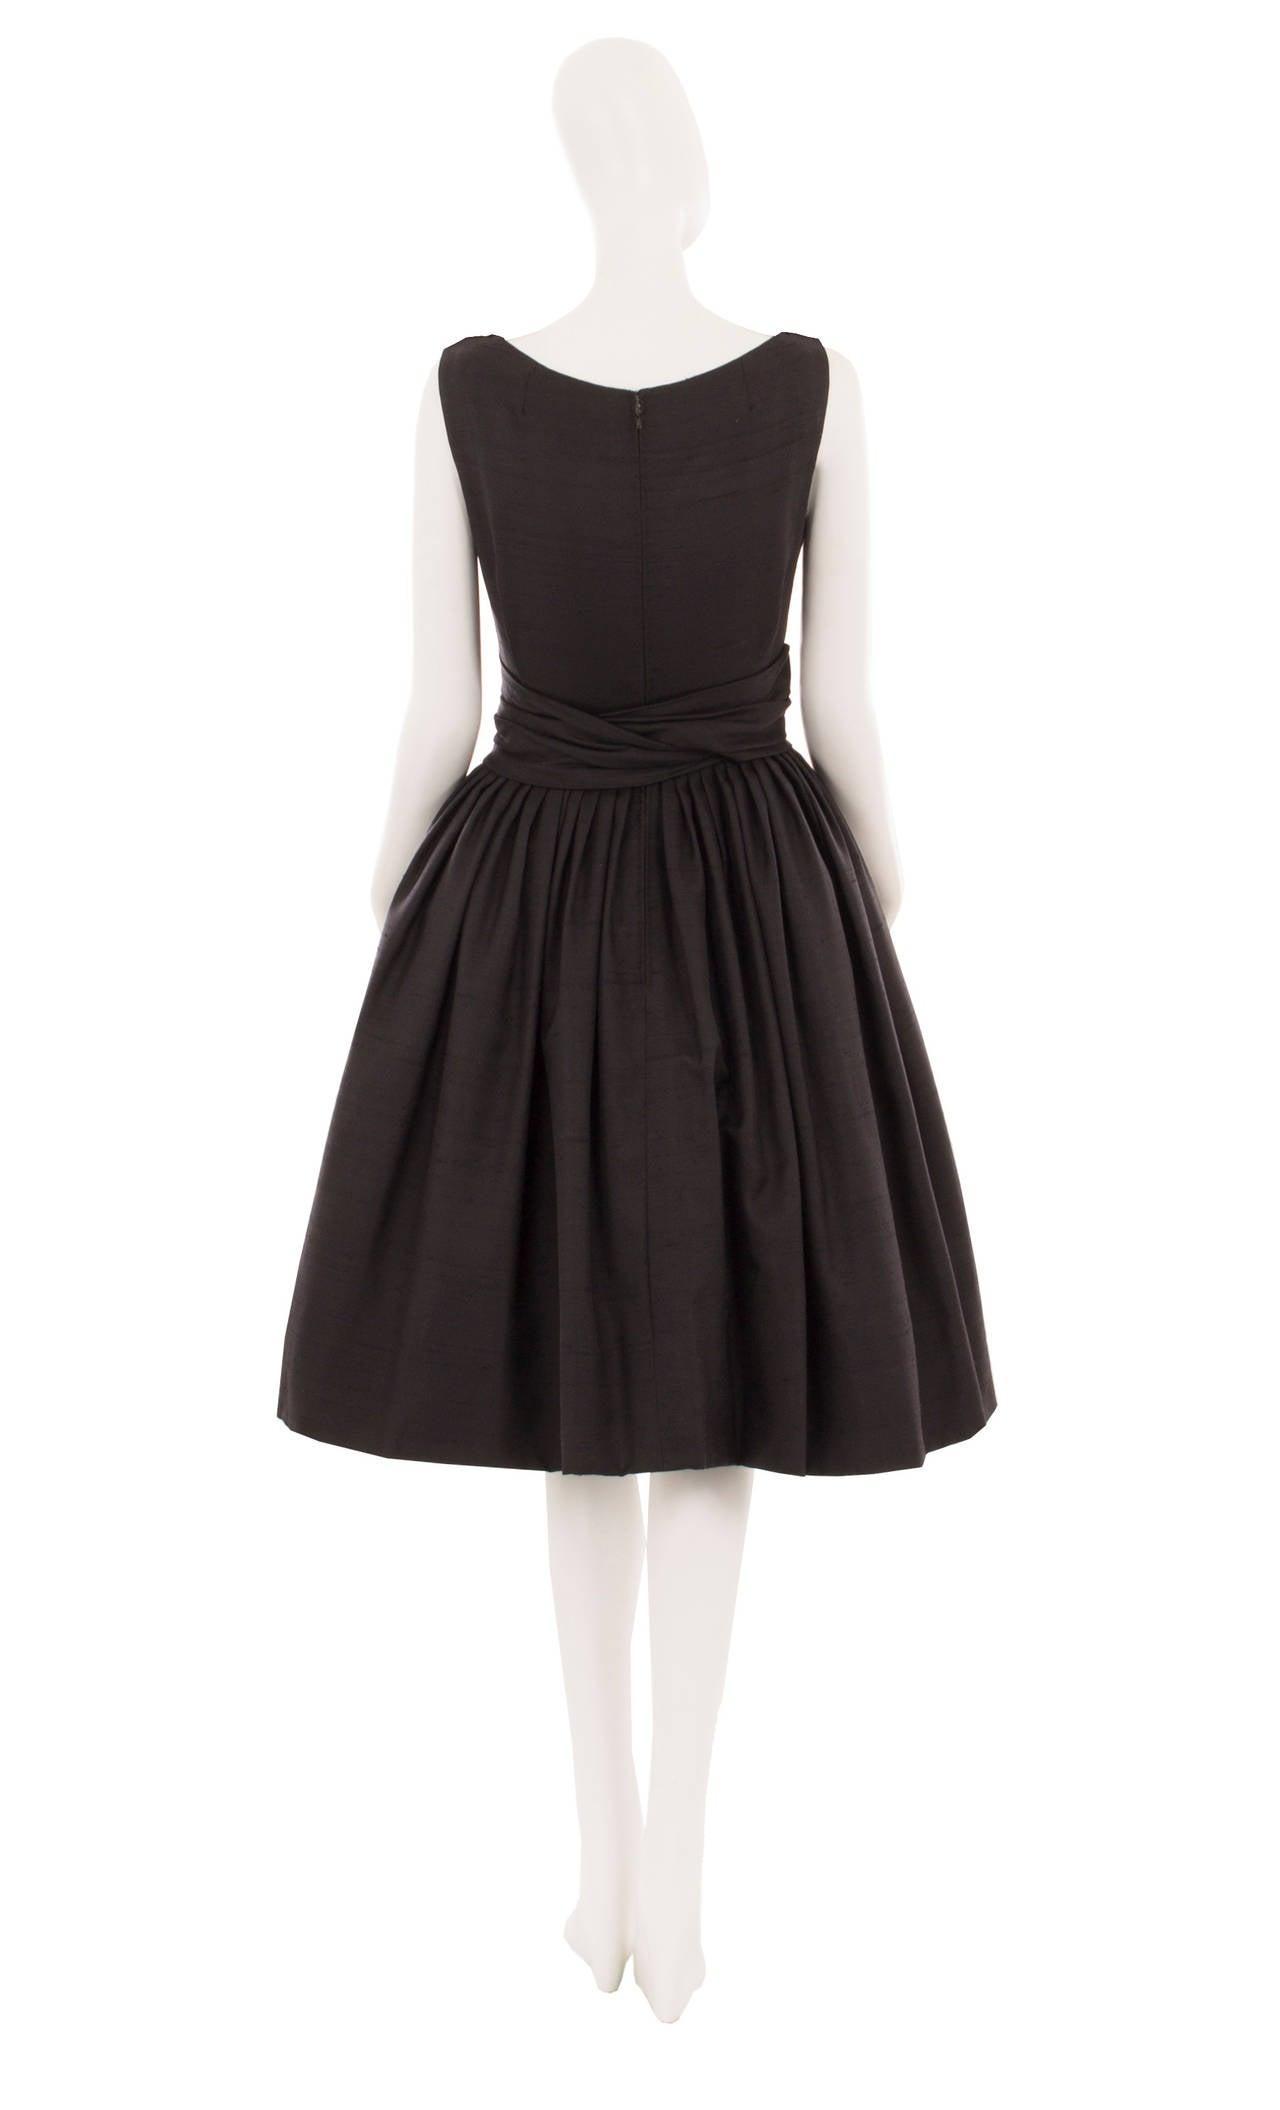 Dior Black Silk Dress, Circa 1958 In Excellent Condition For Sale In London, GB